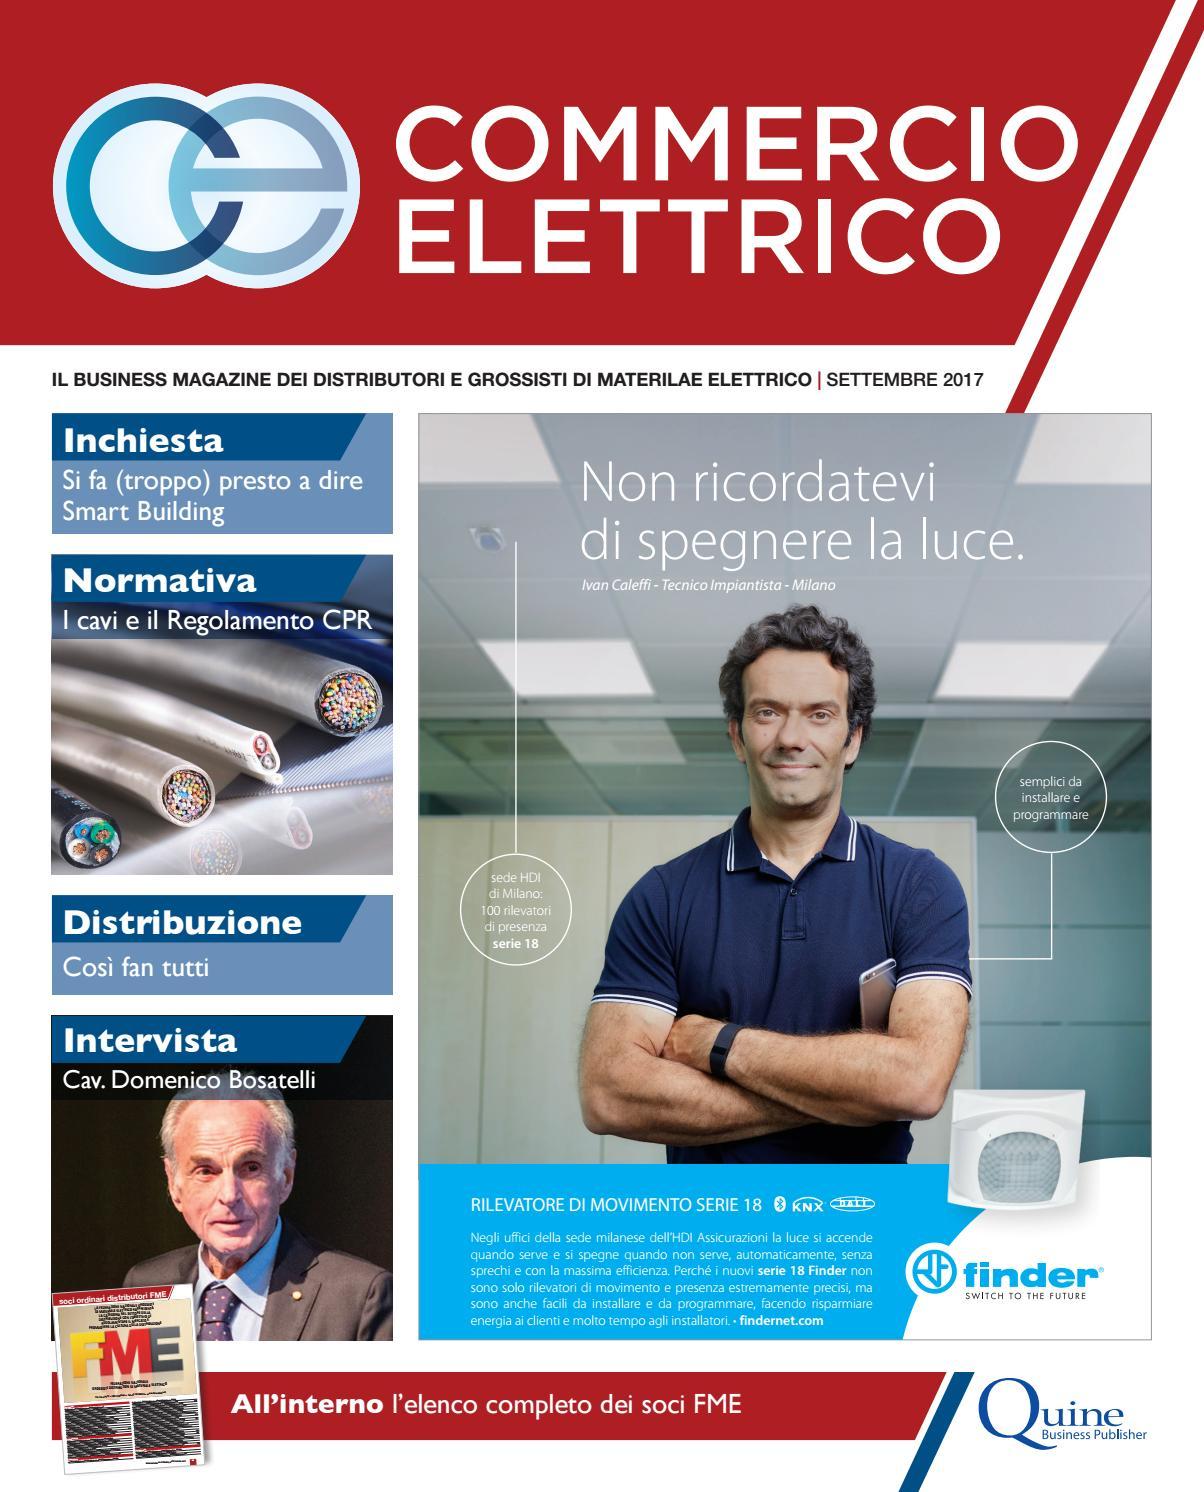 Commercio Elettrico  6 - settembre 2017 by Quine Business Publisher - issuu 42dfce4c247b